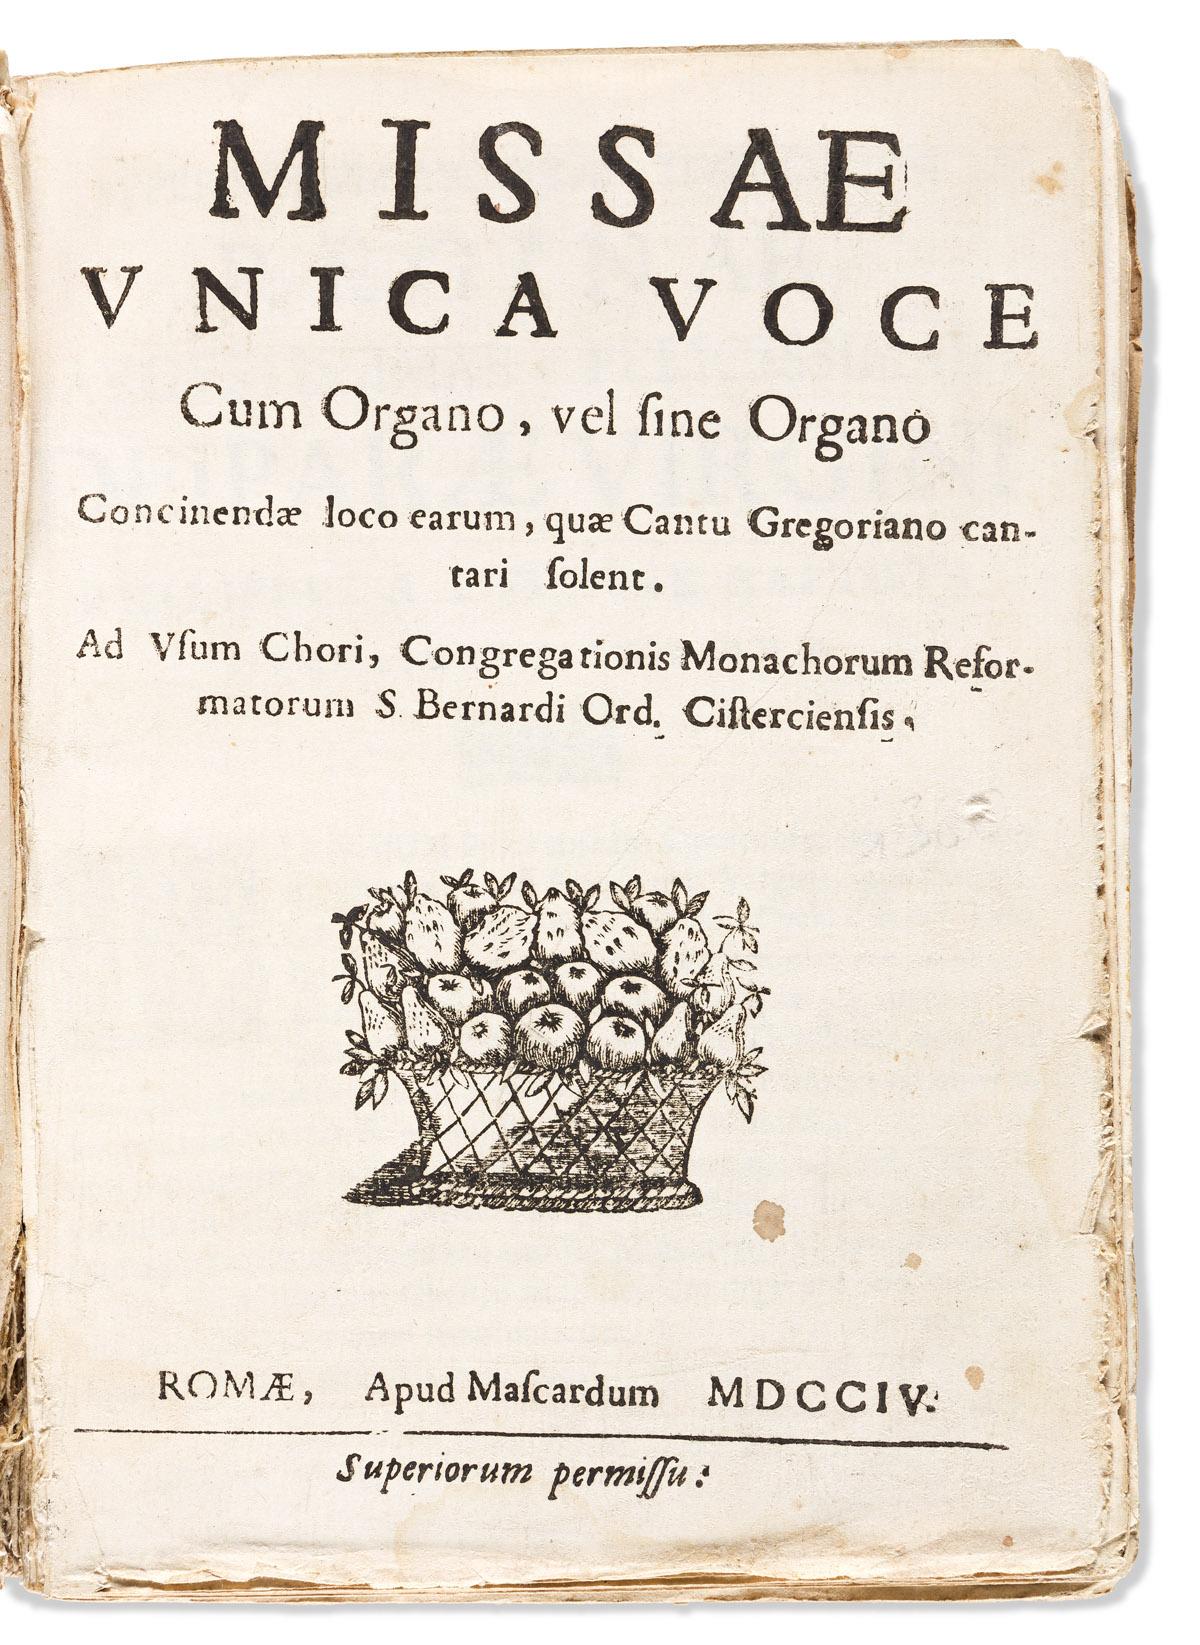 Gregorian Chants, Cistercian. Missae Unica Voce cum Organo, vel since Organo Concinendae loco earum, quae Cantu Gregoriano cantari sole